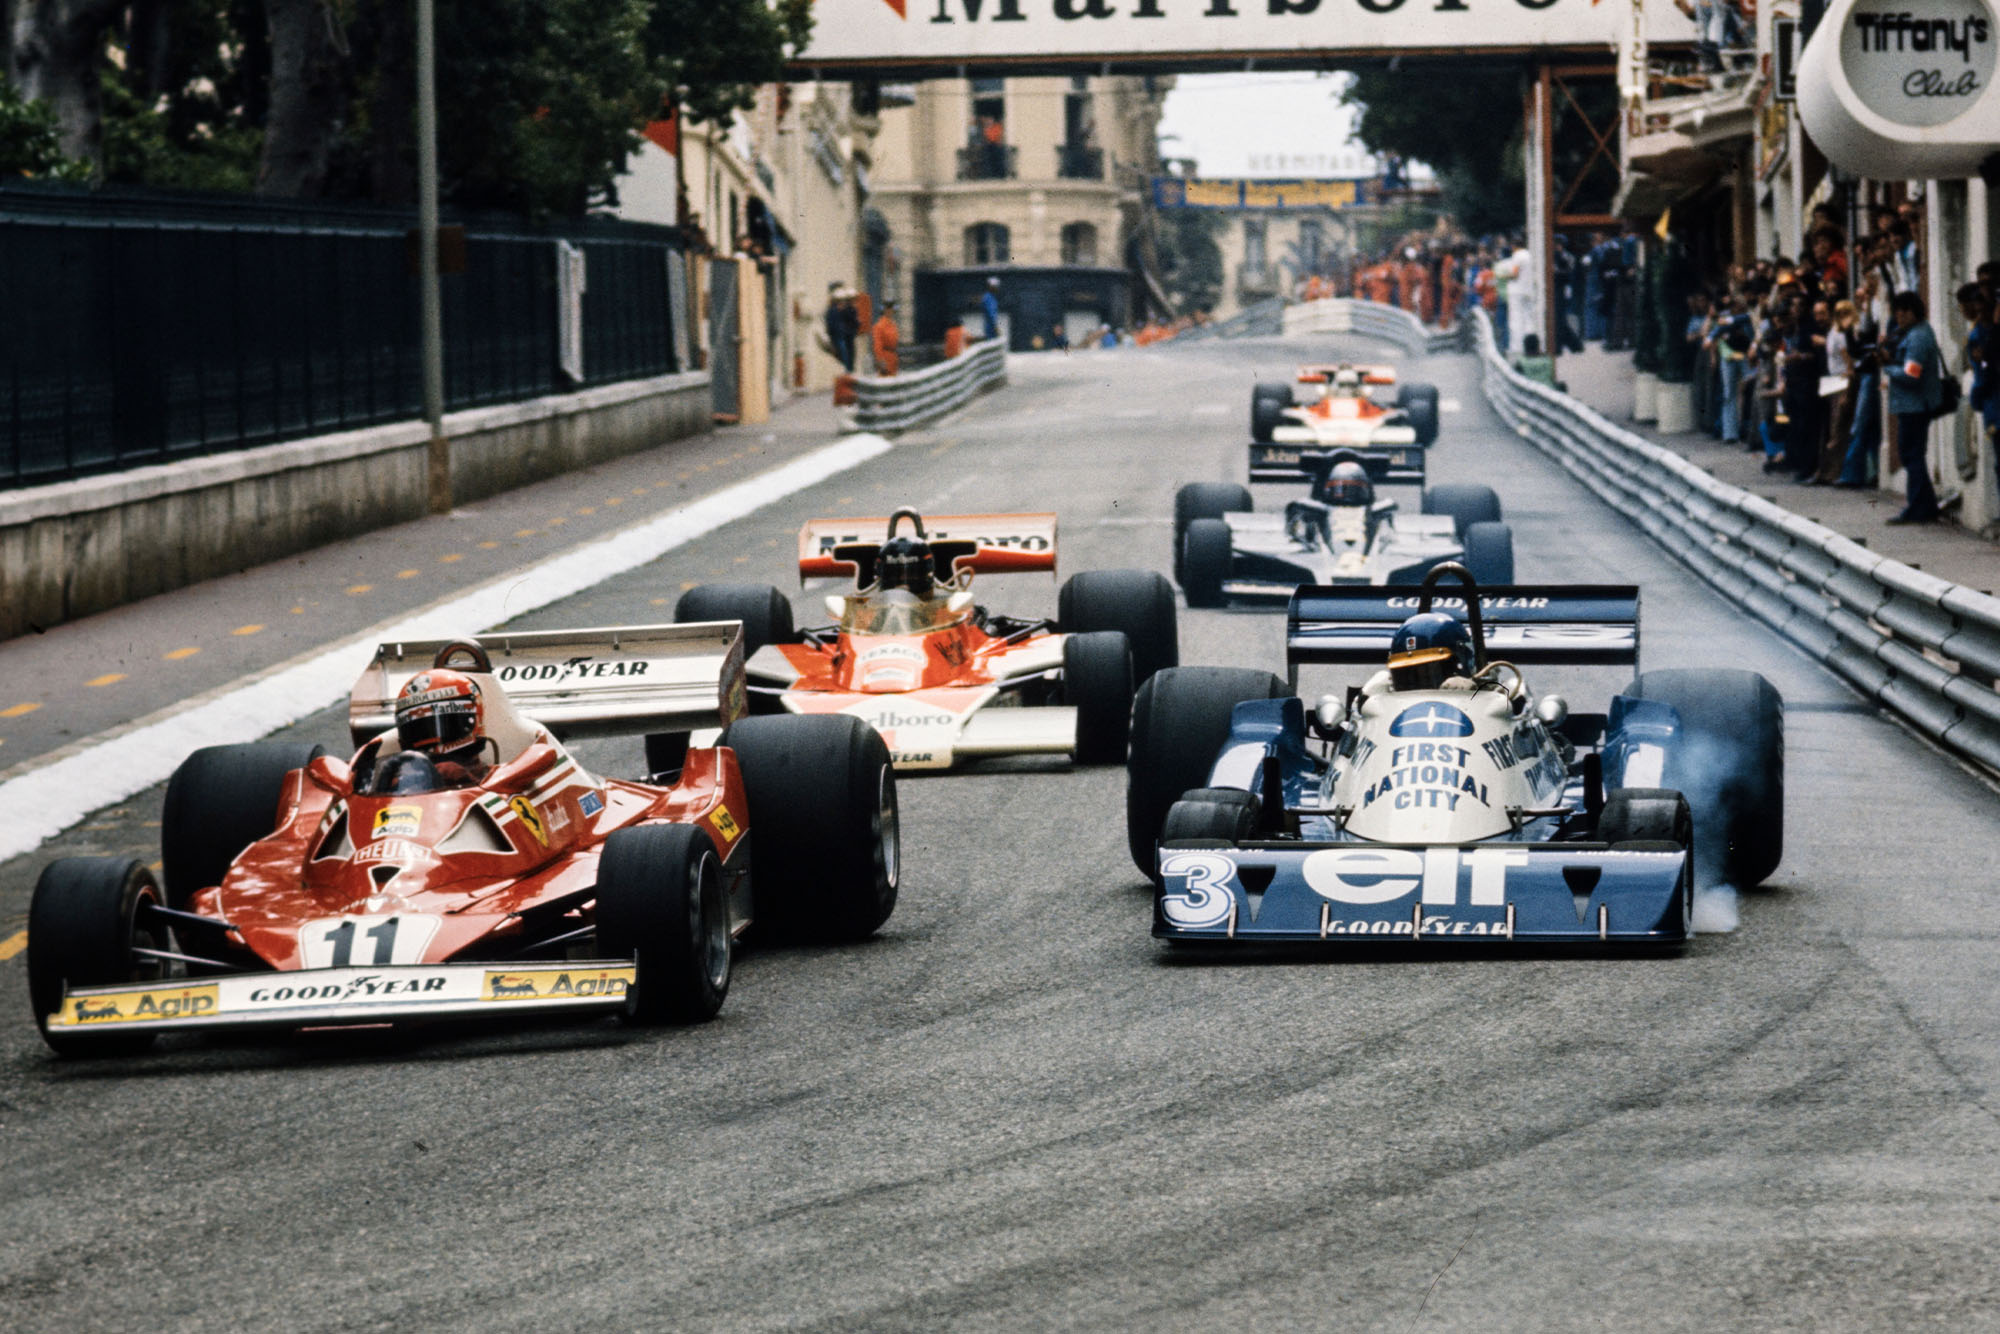 Niki Lauda (Ferrari) fights with Ronnie Peterson Tyrrell at the 1977 Monaco Grand Prix.